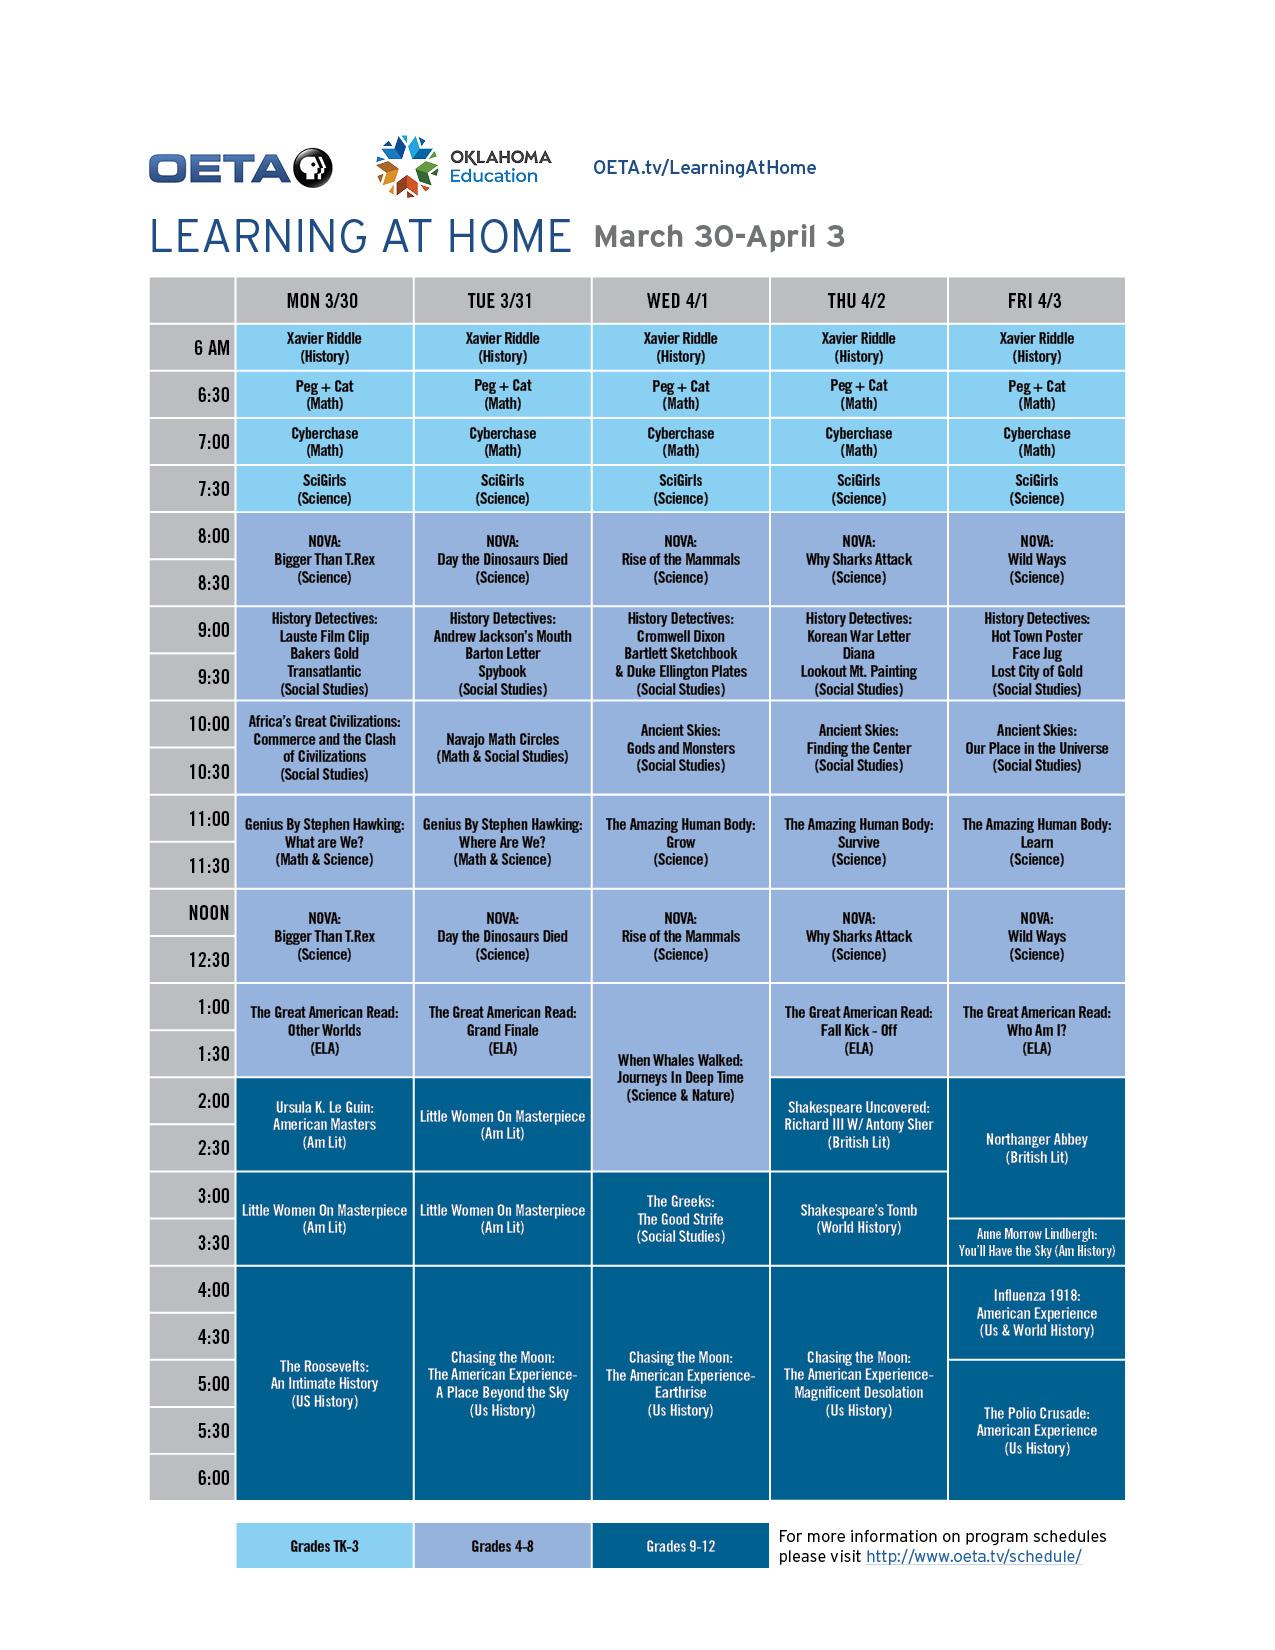 OETA WORLD Guide - March 30-April 3